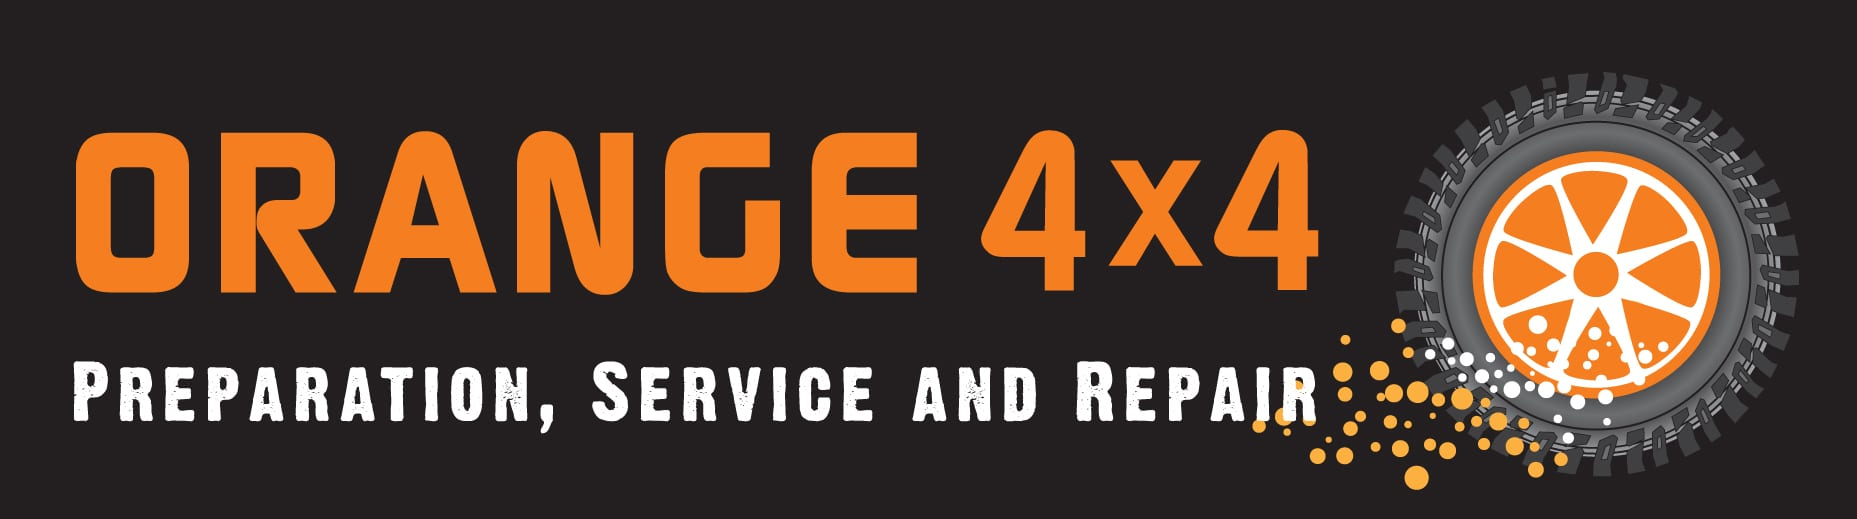 Orange 4x4